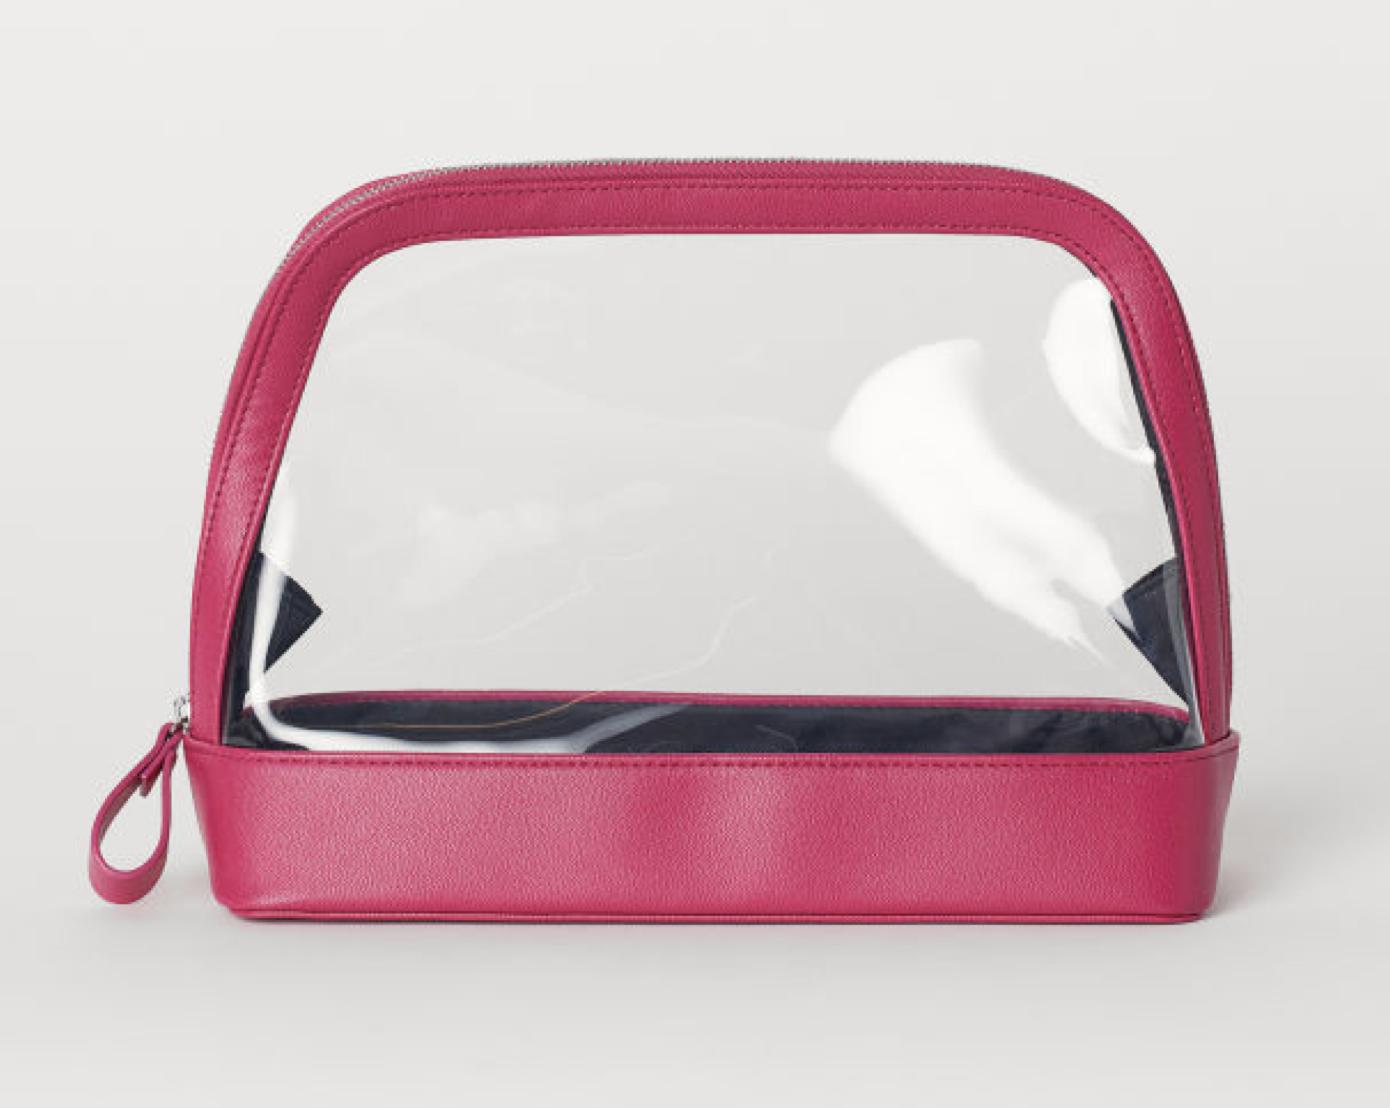 Transparent Toiletry Bag